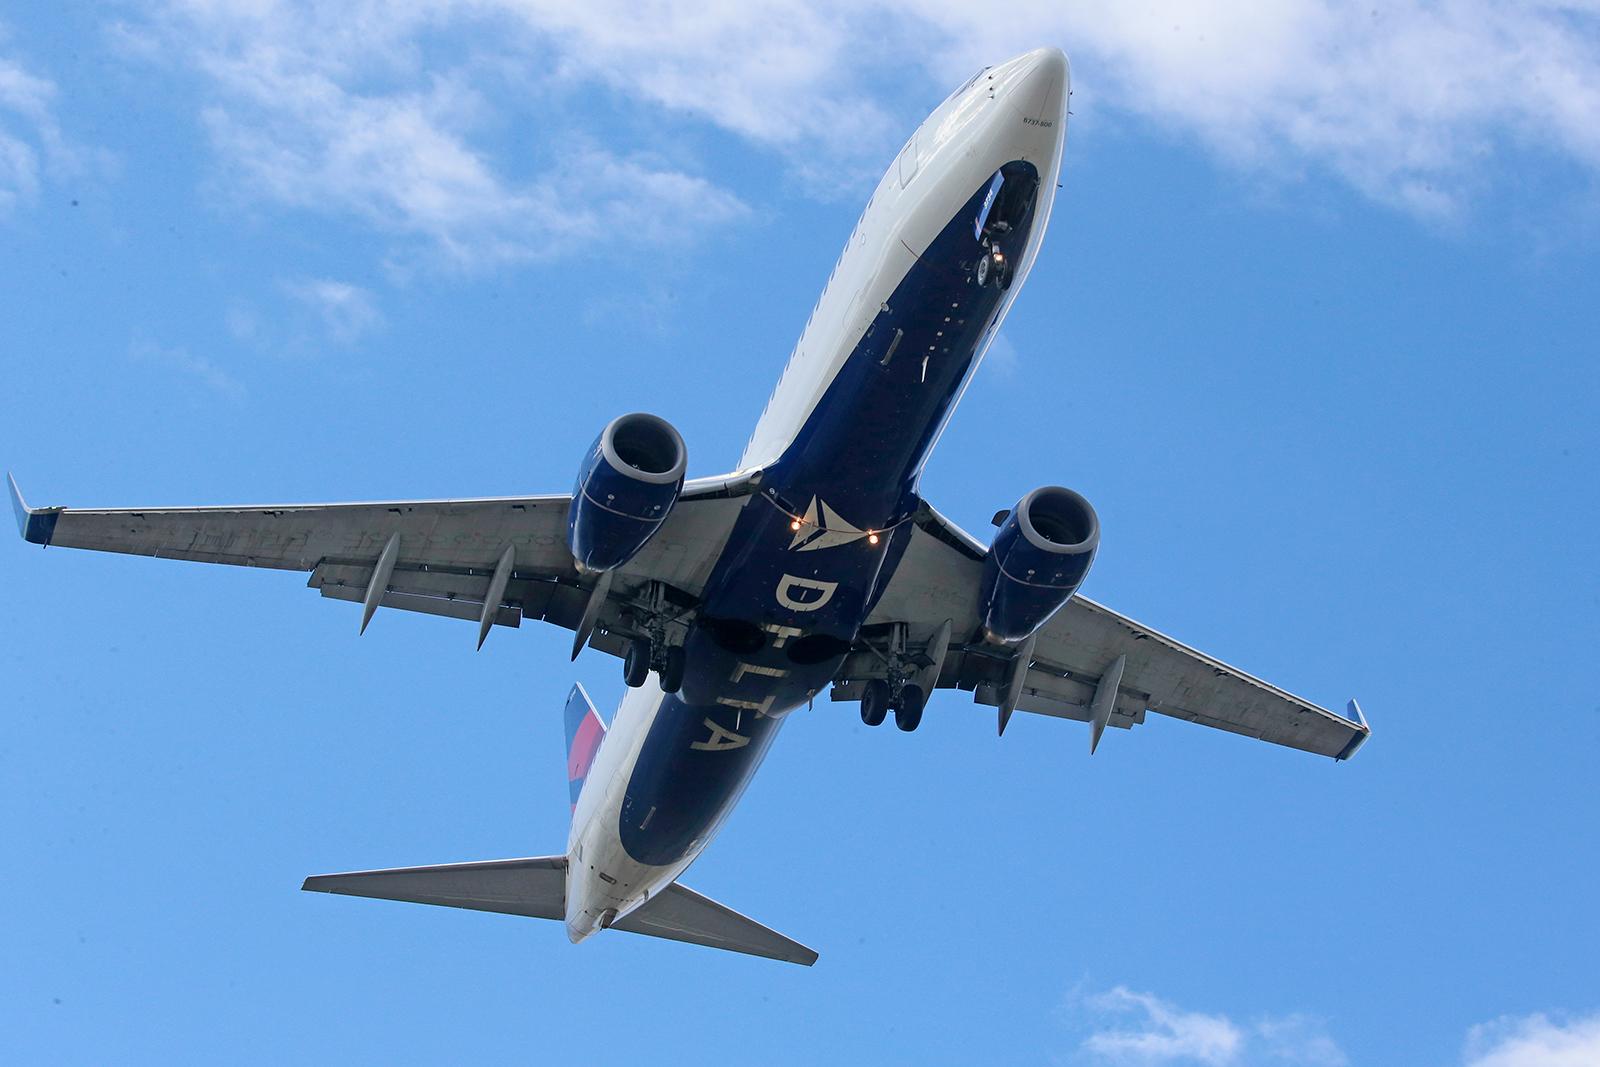 A Delta Air Lines jet lands at Salt Lake City International Airport in Salt Lake City, Utah on April 22.